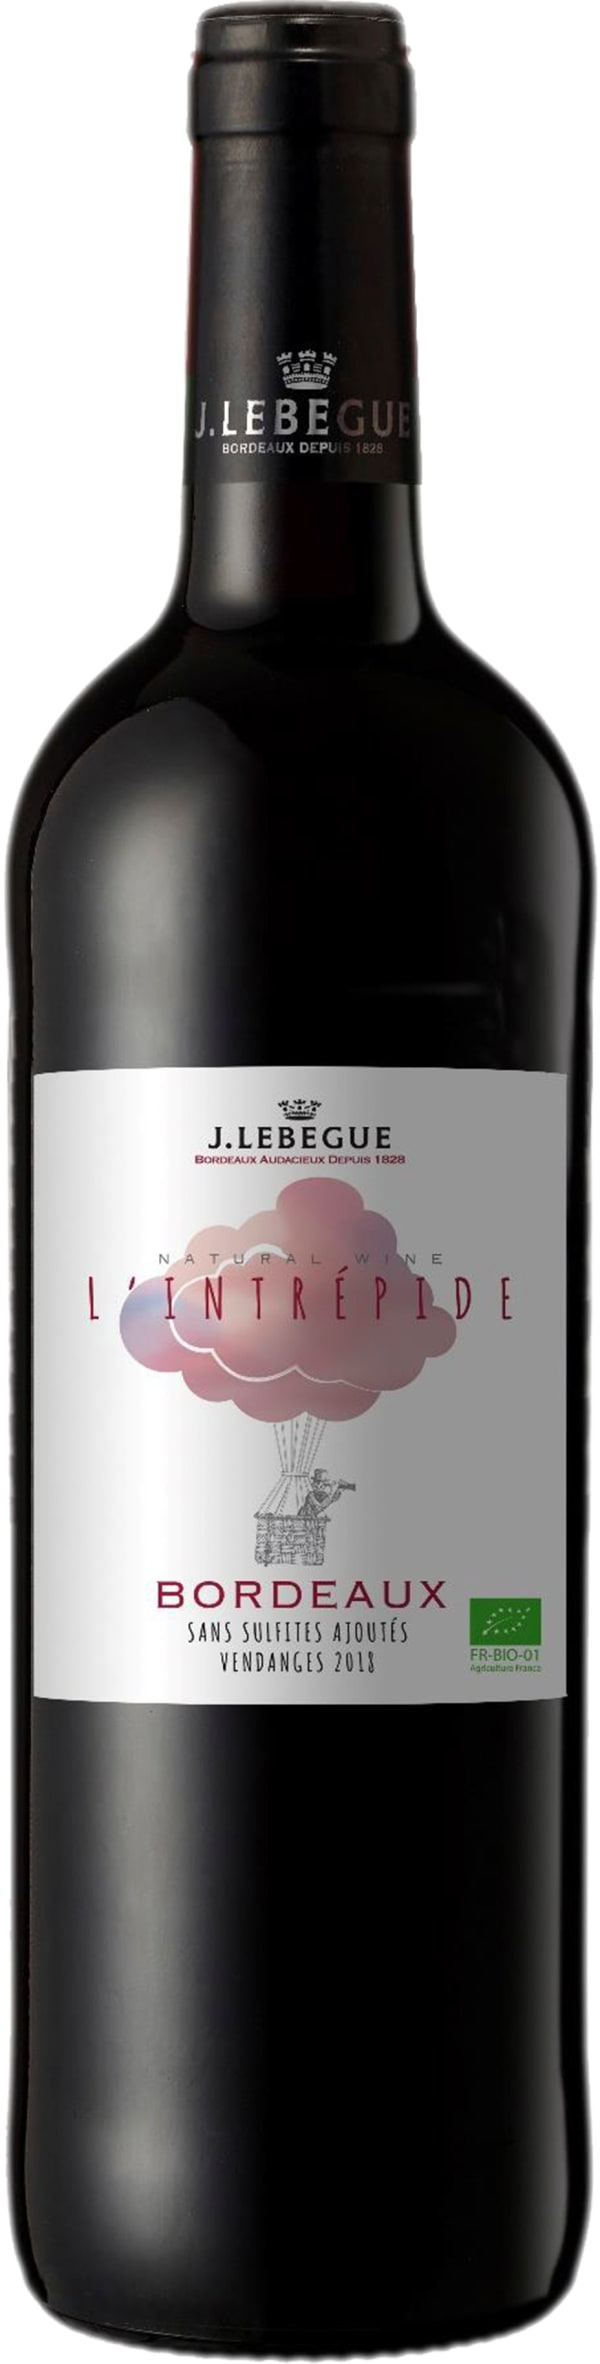 L'Intrépide Natural Wine 2018